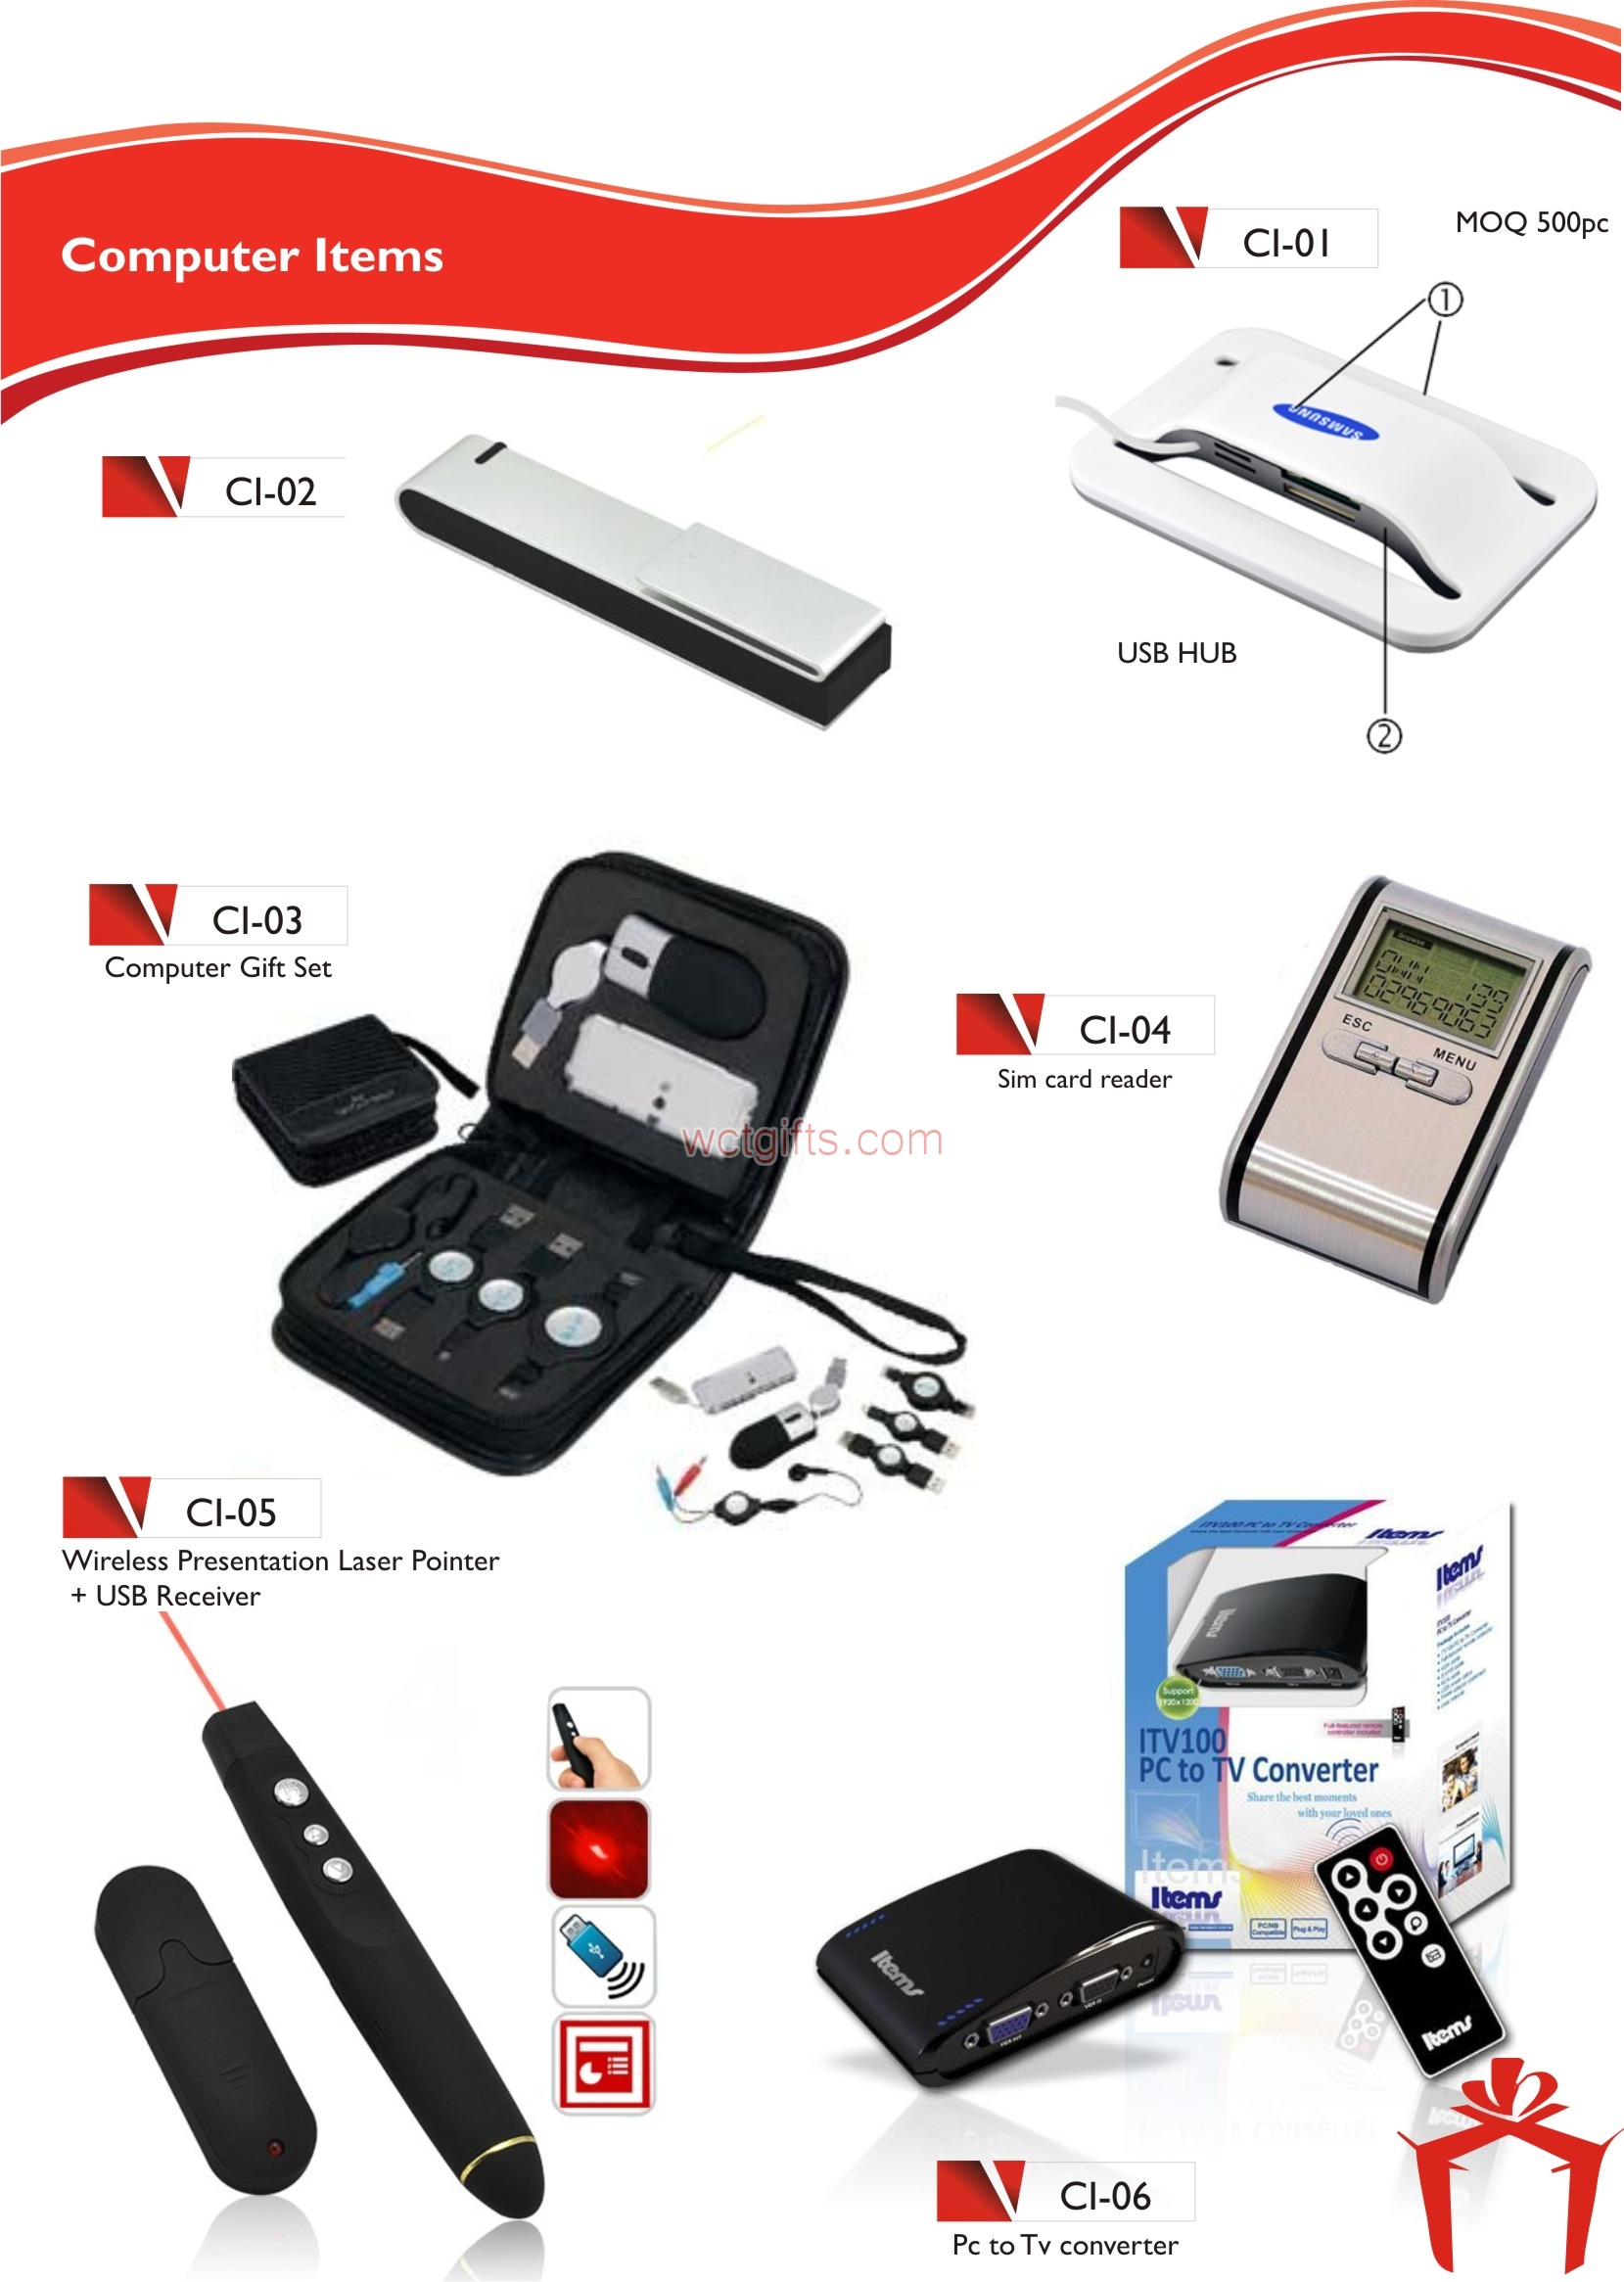 Computer Items